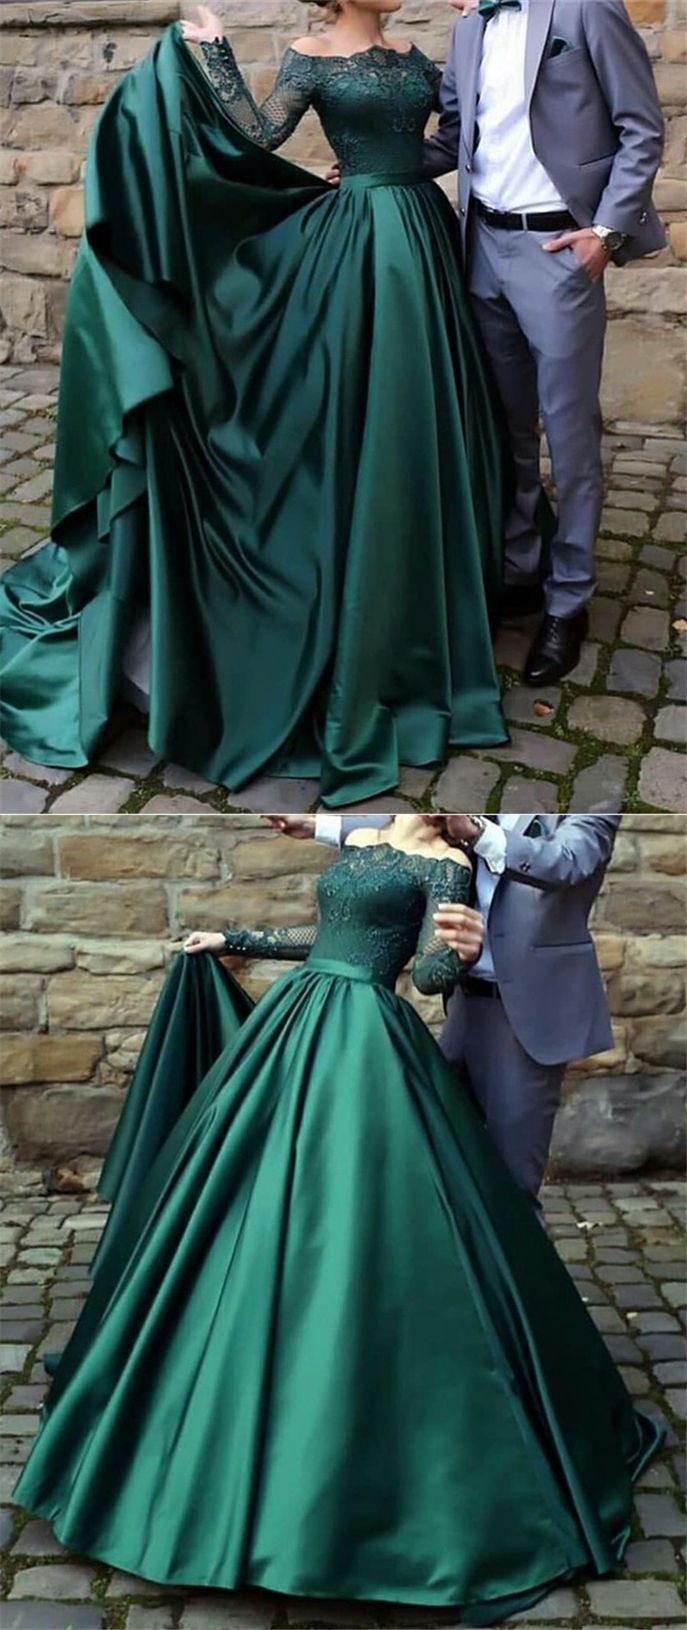 10 Genial Dunkelgrünes Abendkleid Bester Preis20 Schön Dunkelgrünes Abendkleid Galerie